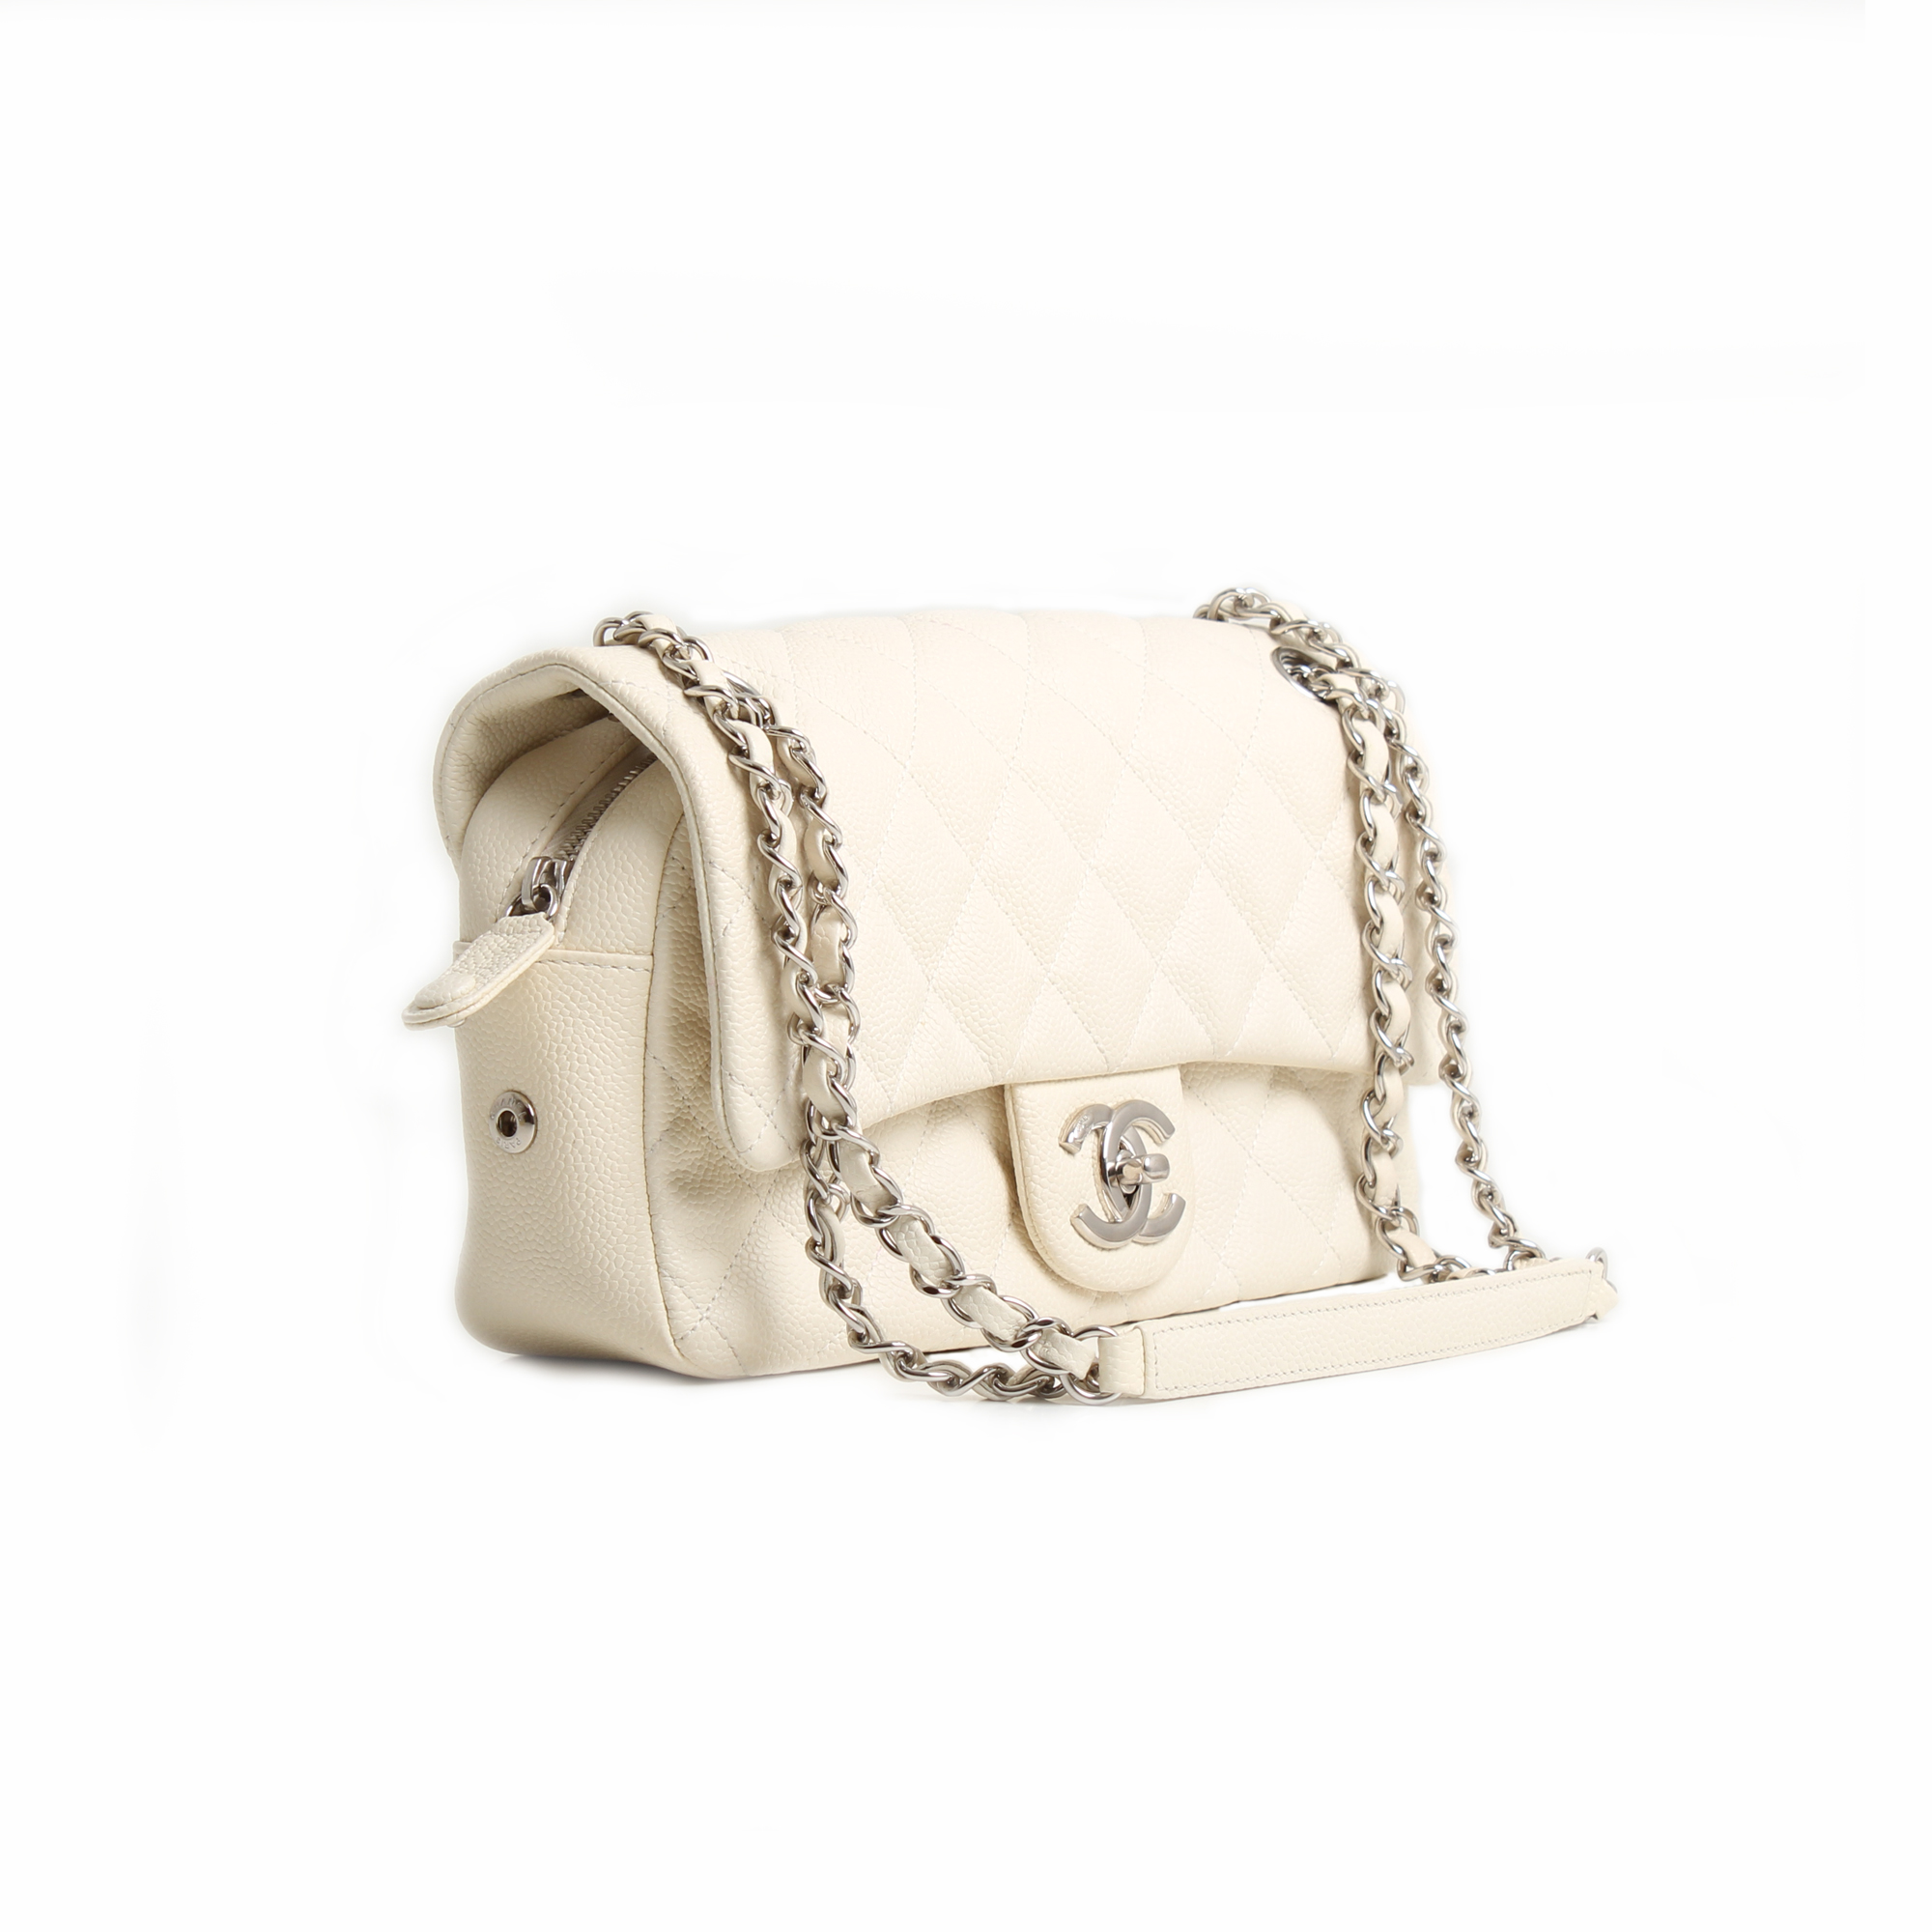 cdd91e42adf2 chanel easy zip medium bag white caviar leather front